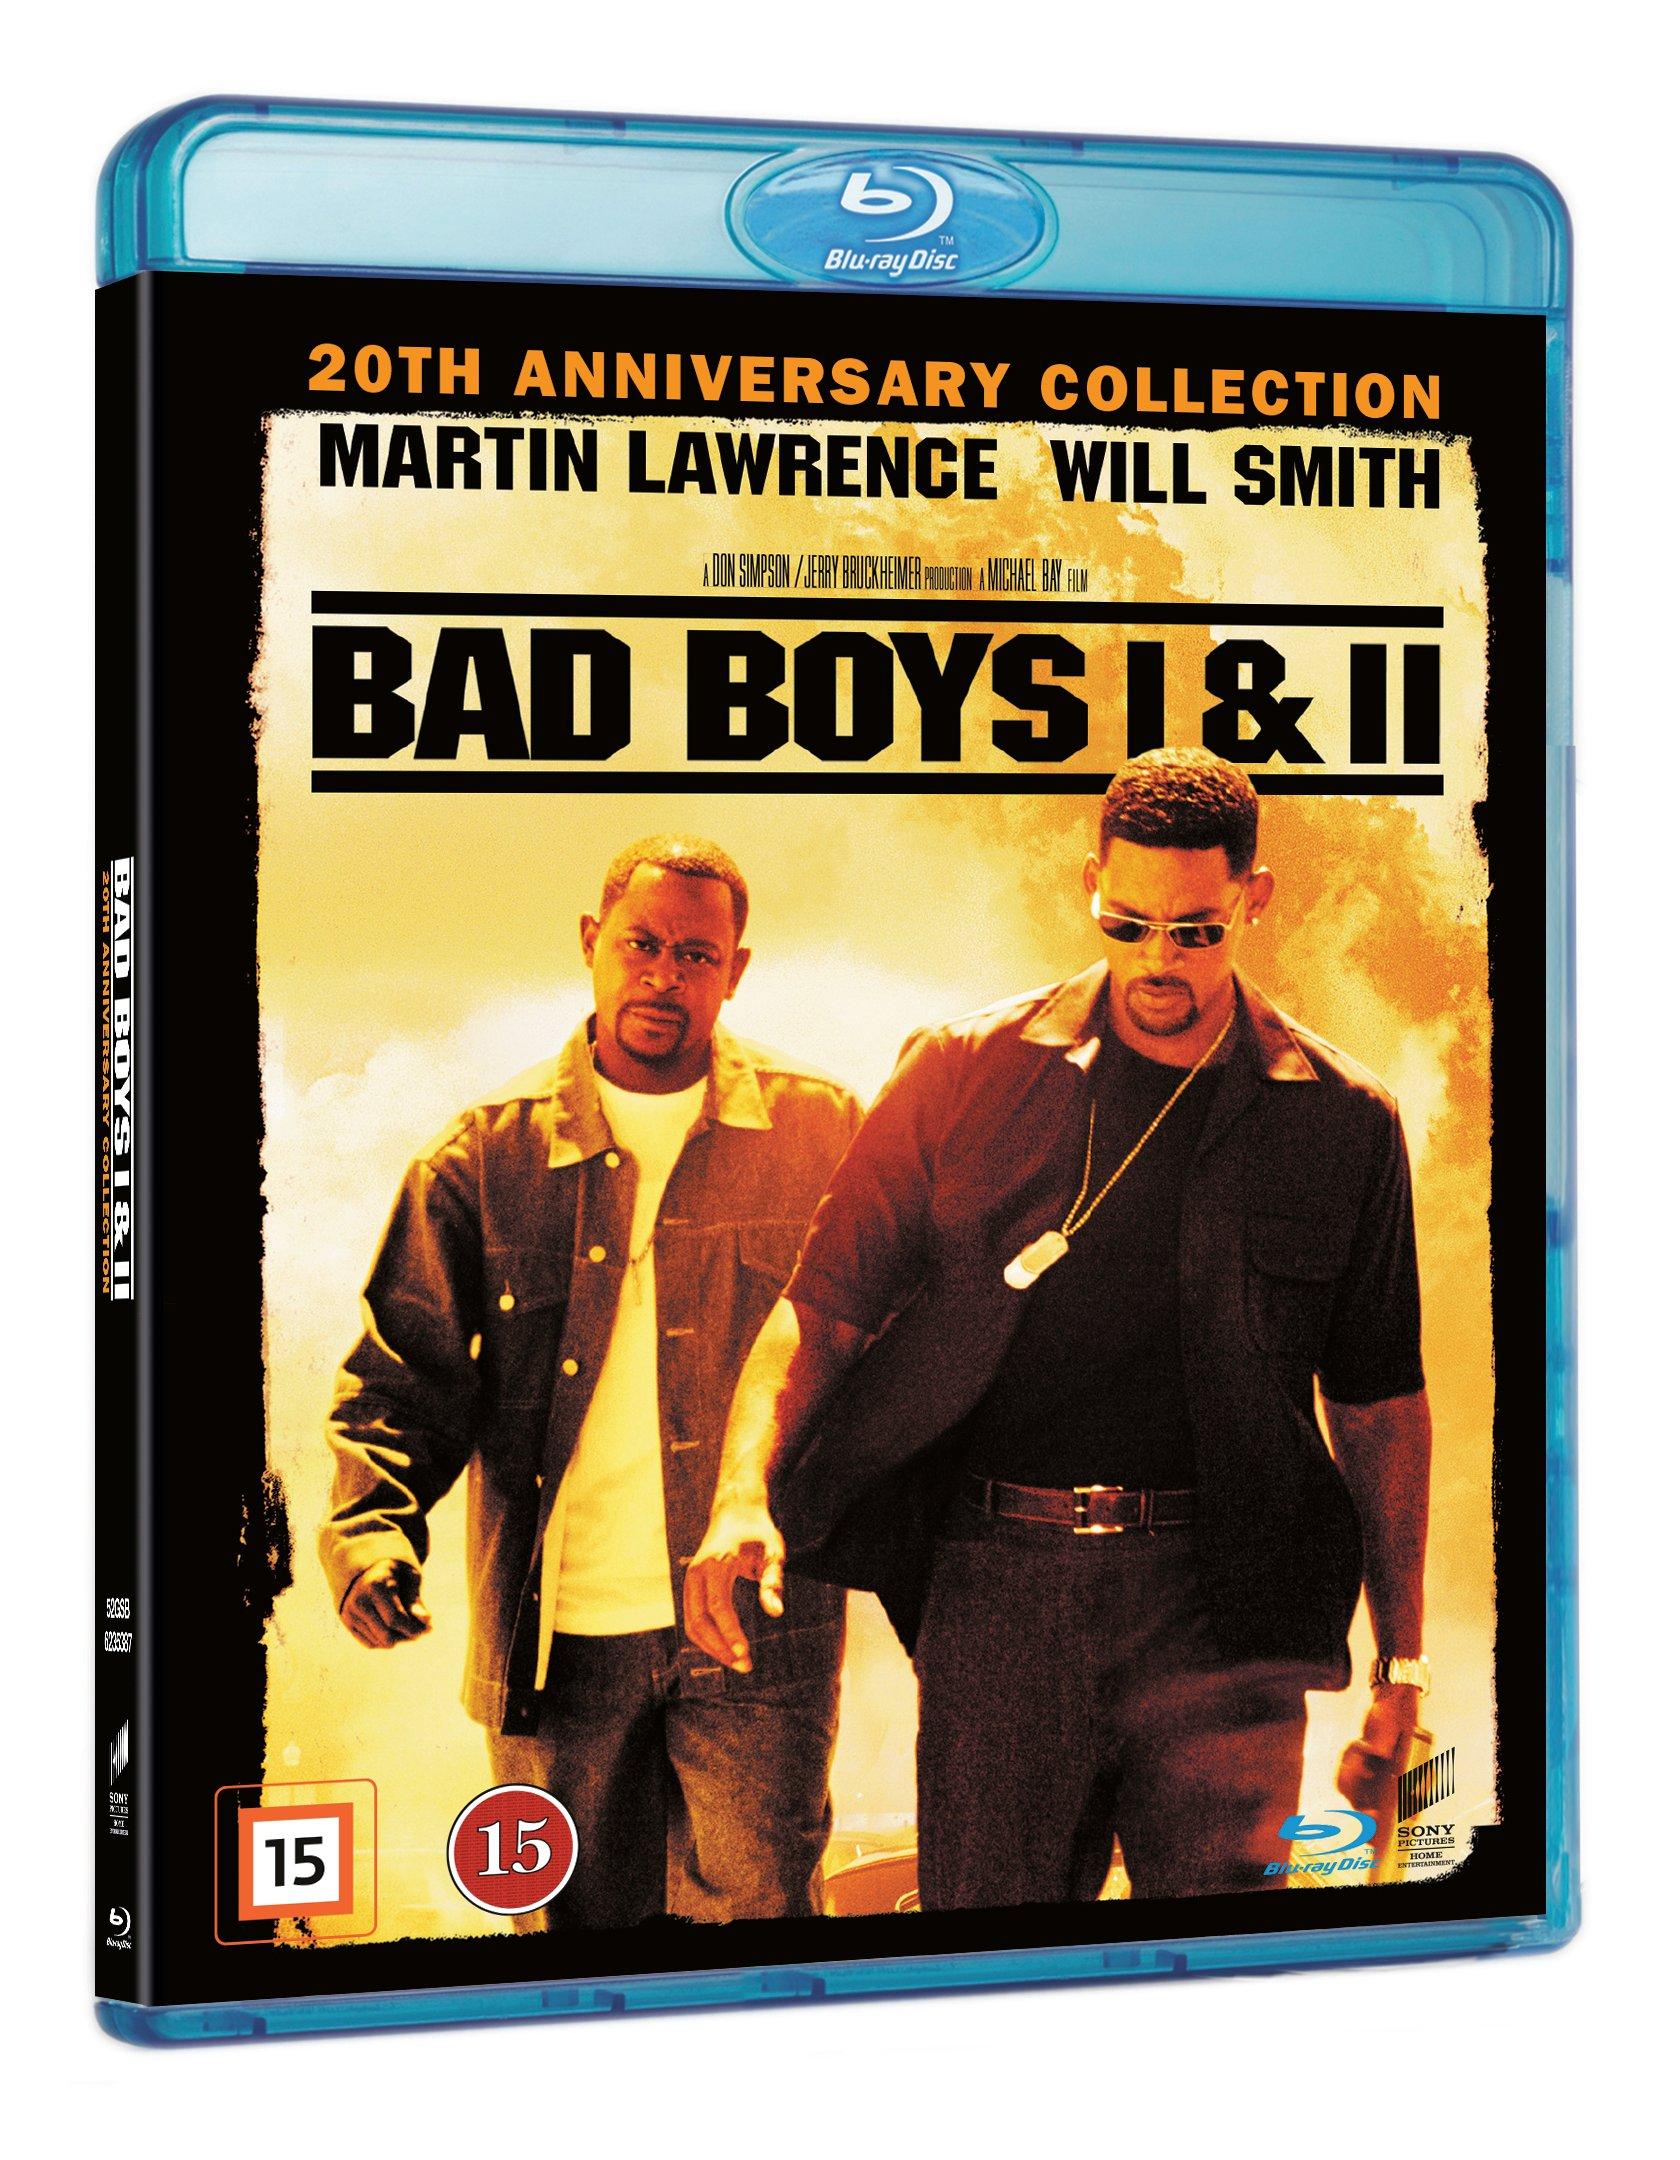 Bad Boys 1 & 2 Blu ray